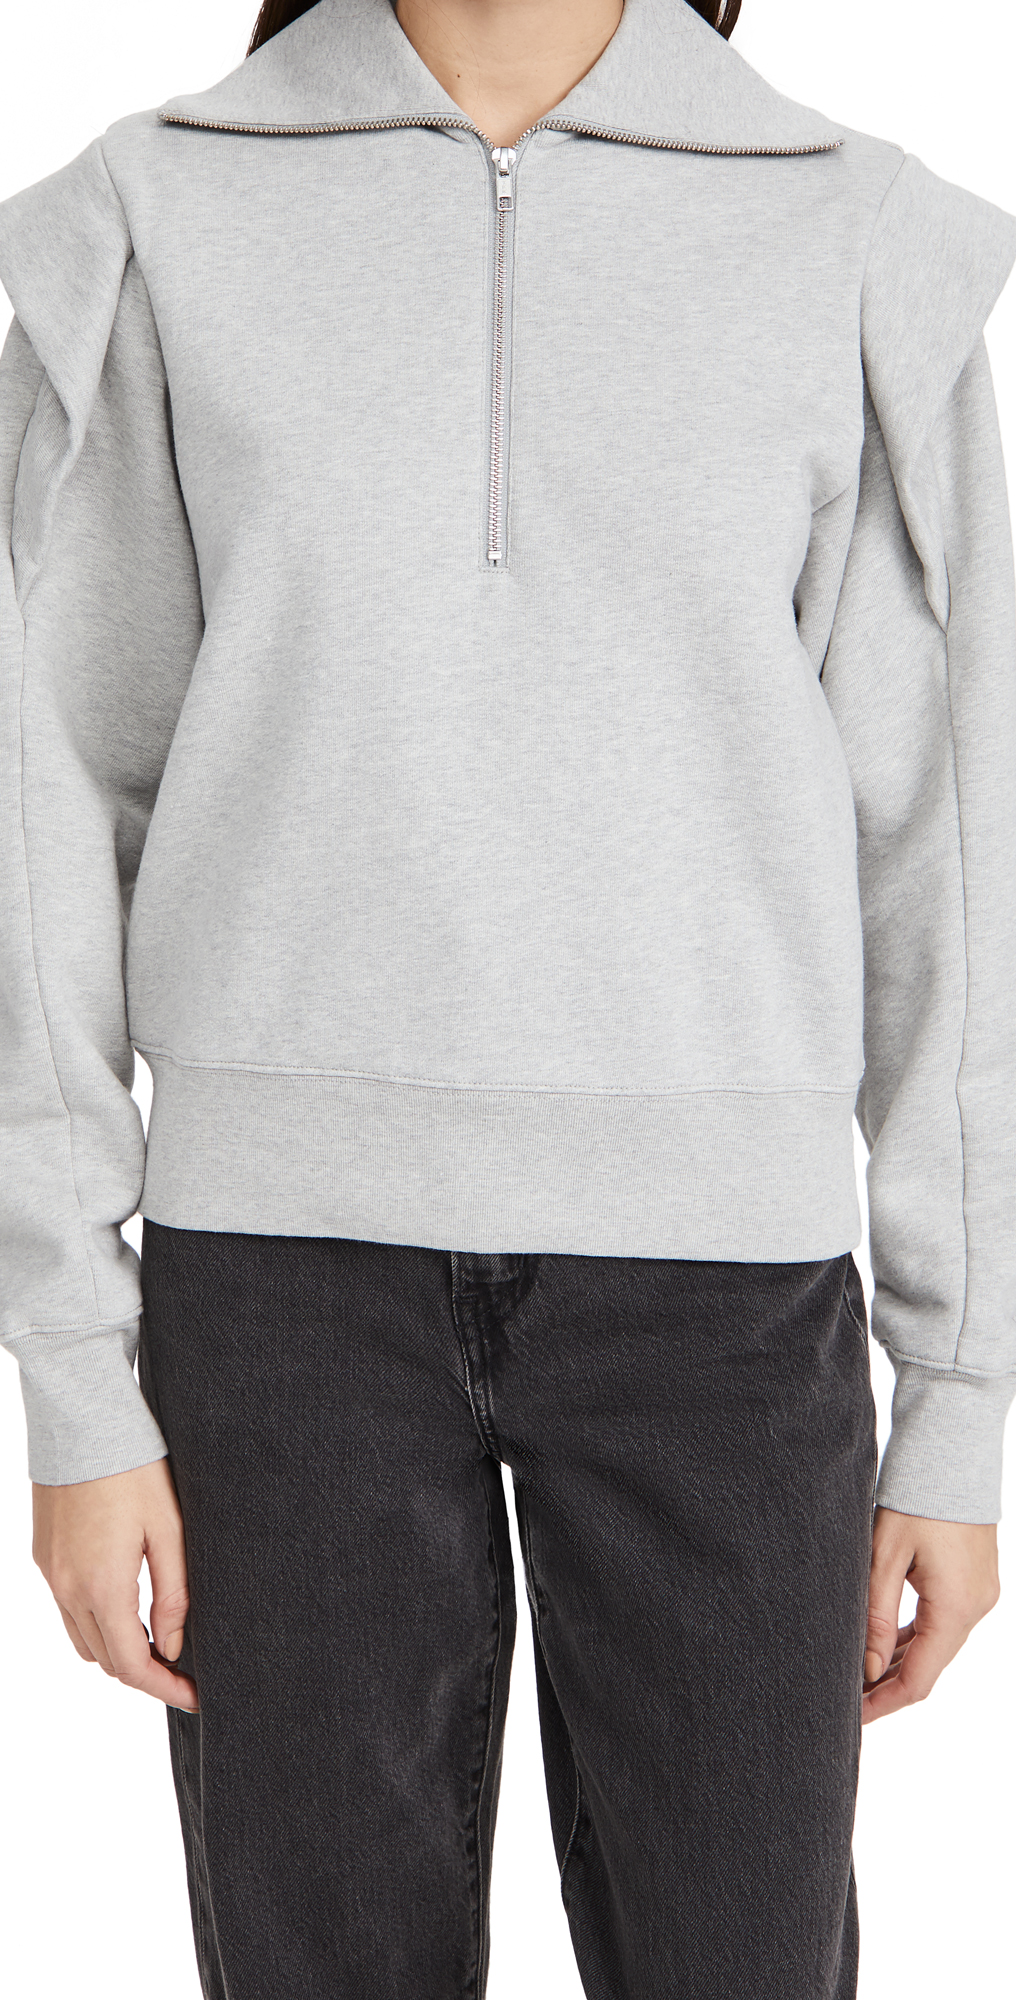 FRAME Sporty Zip Sweatshirt